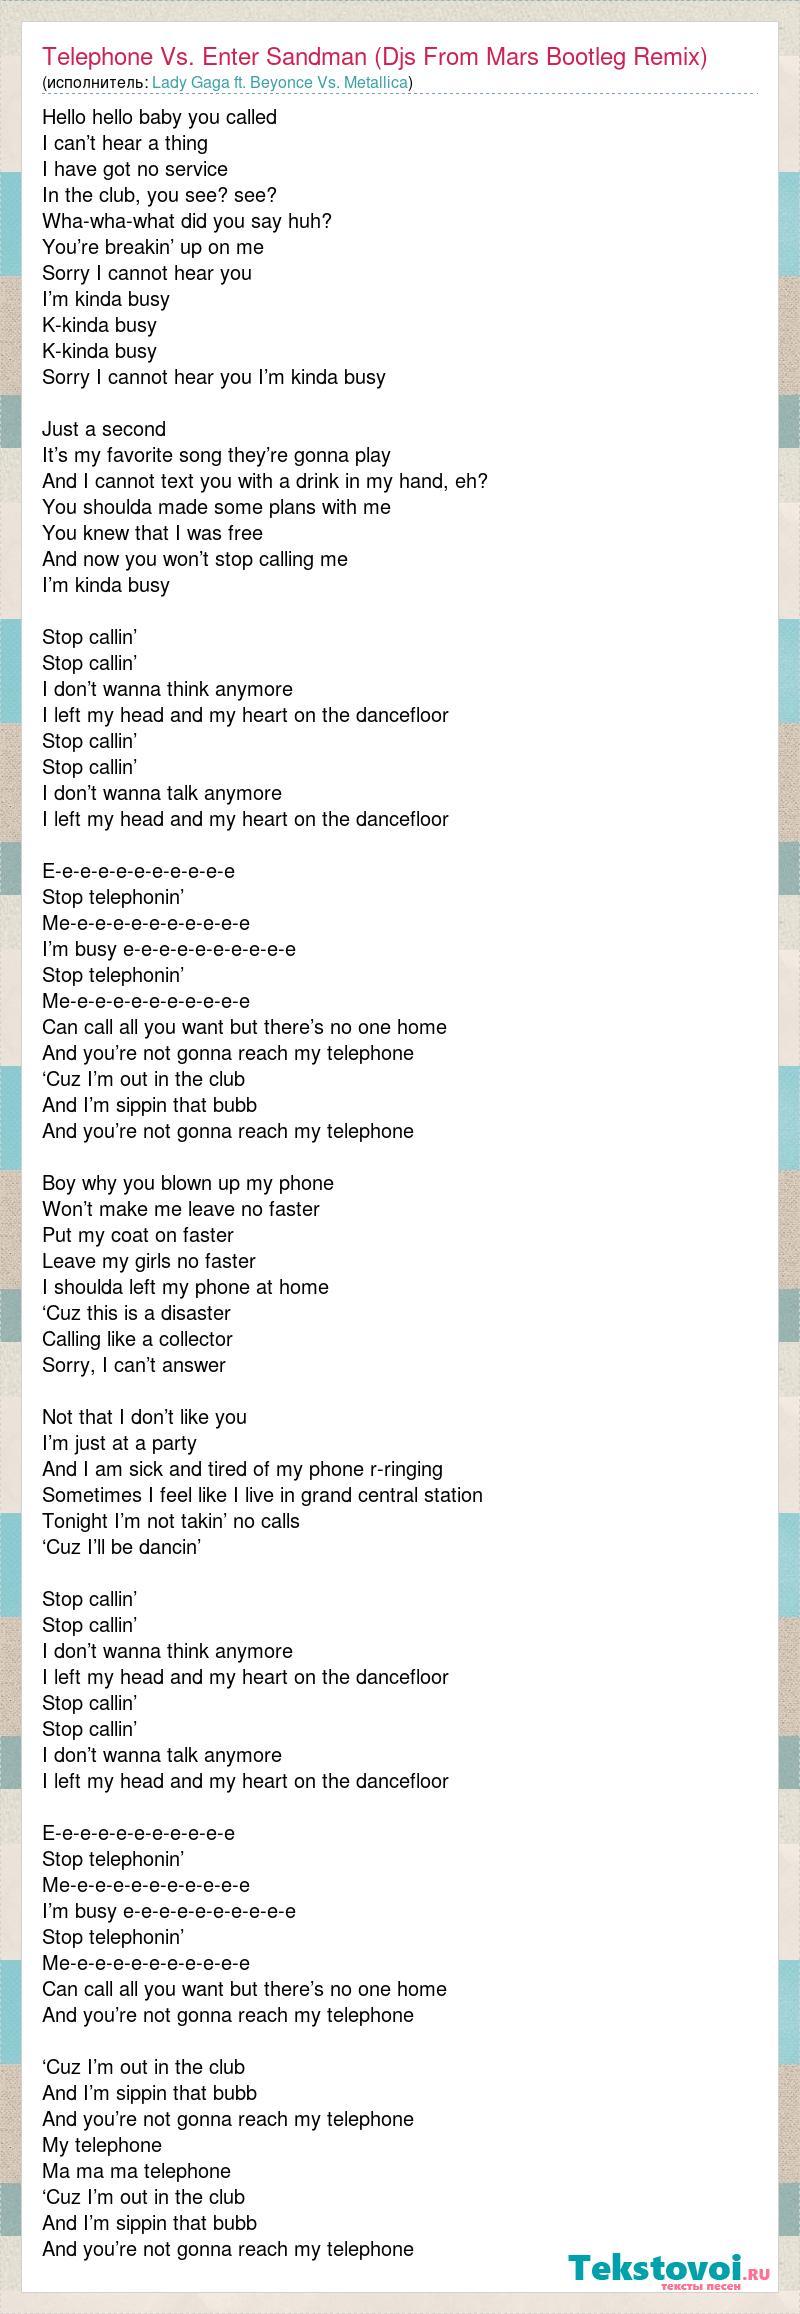 Lady Gaga ft  Beyonce Vs  Metallica: Telephone Vs  Enter Sandman